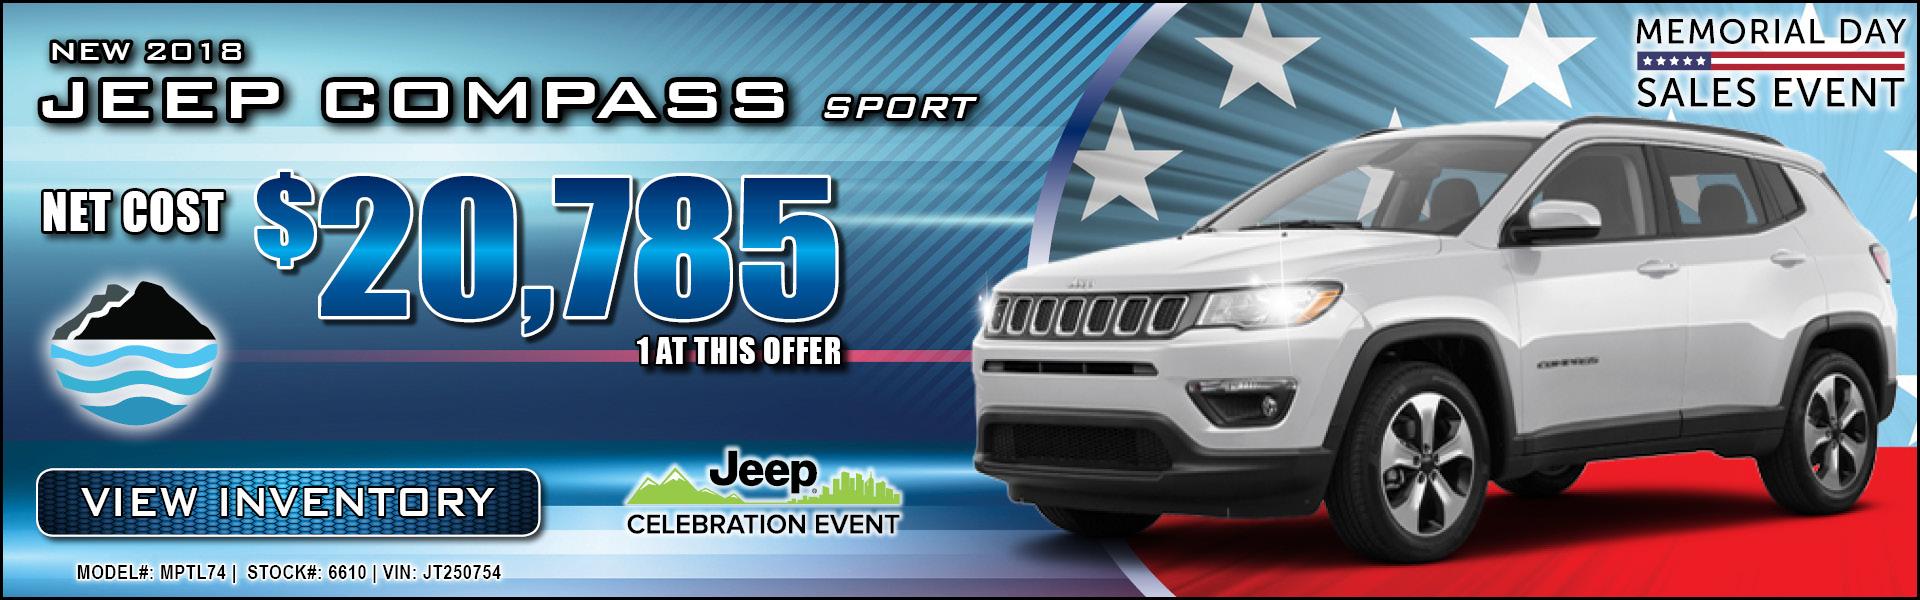 Jeep Compass $20,785